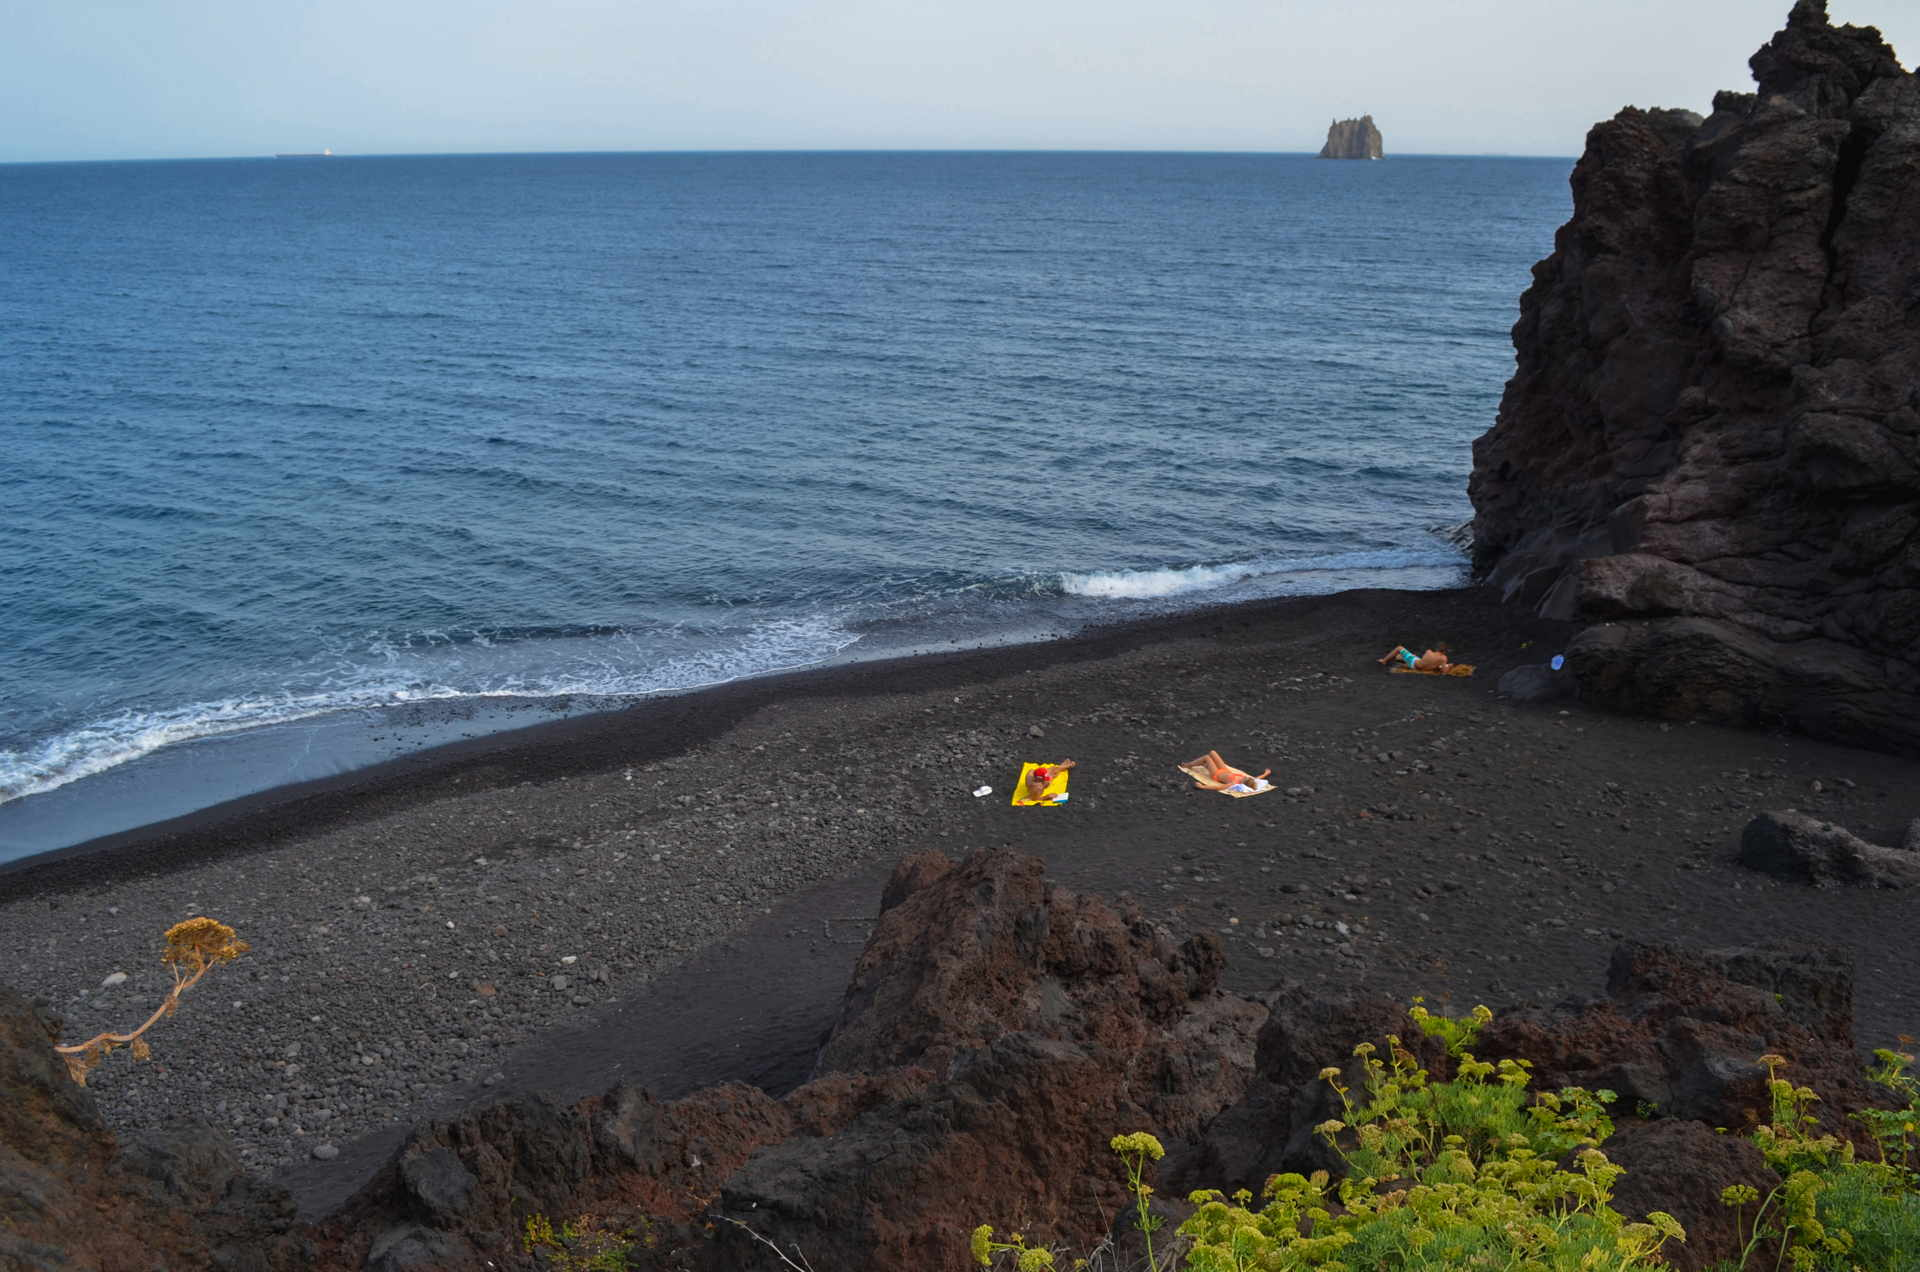 Grotta d'Eolo, stromboli beach, black sand beach stromboli, best beach of stromboli, stromboli travel, aeolian islands travel guide, cheap travel stromboli